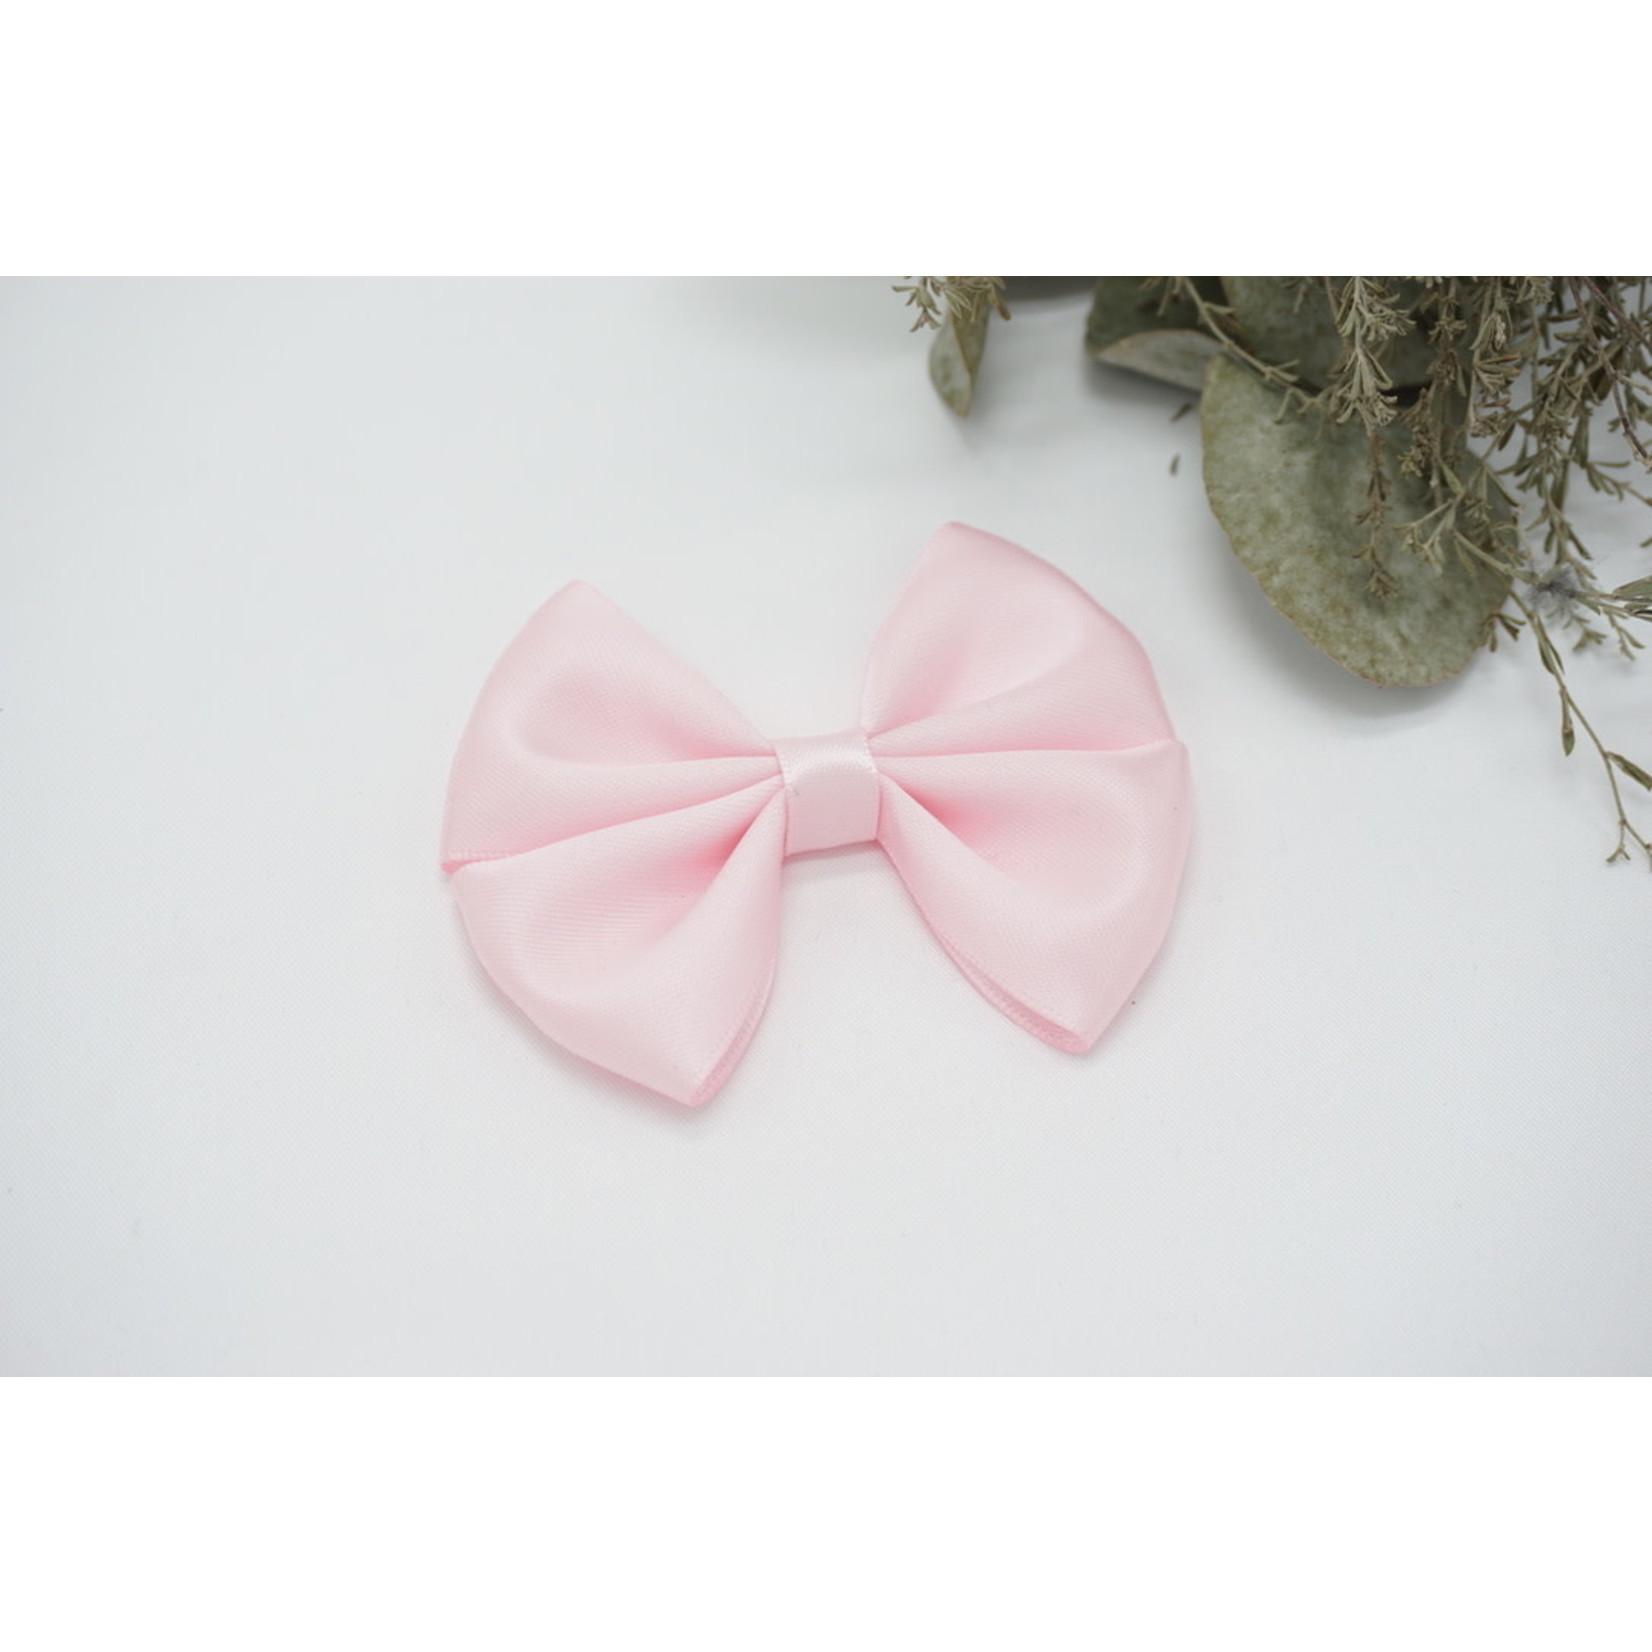 Petite Zara Satin Bow - Princess Pink